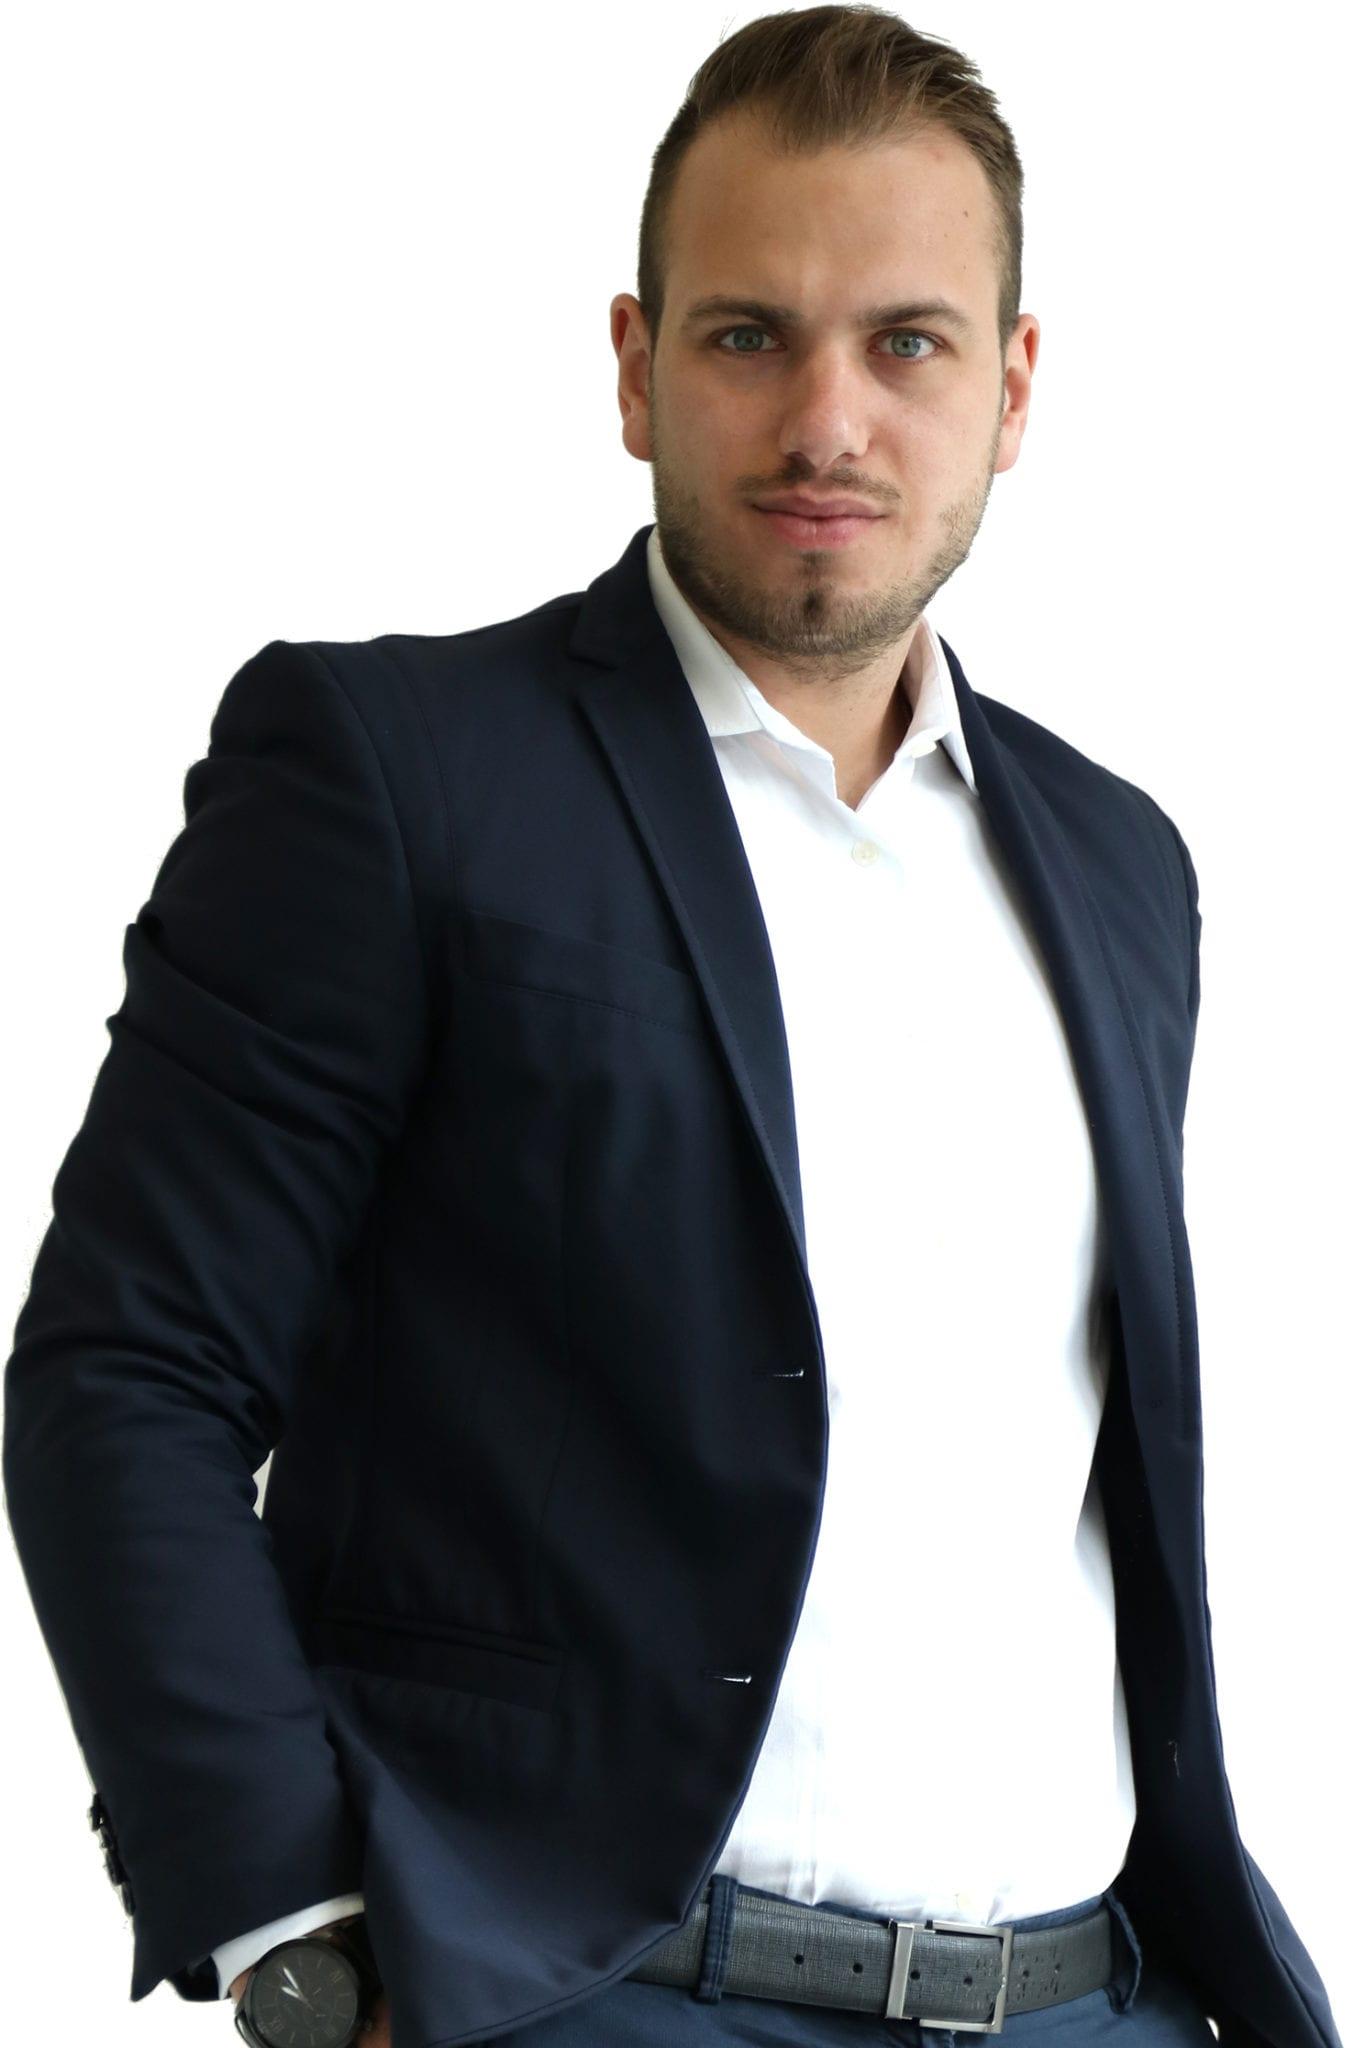 Michael Bassi, Apface gestione pagine Facebook